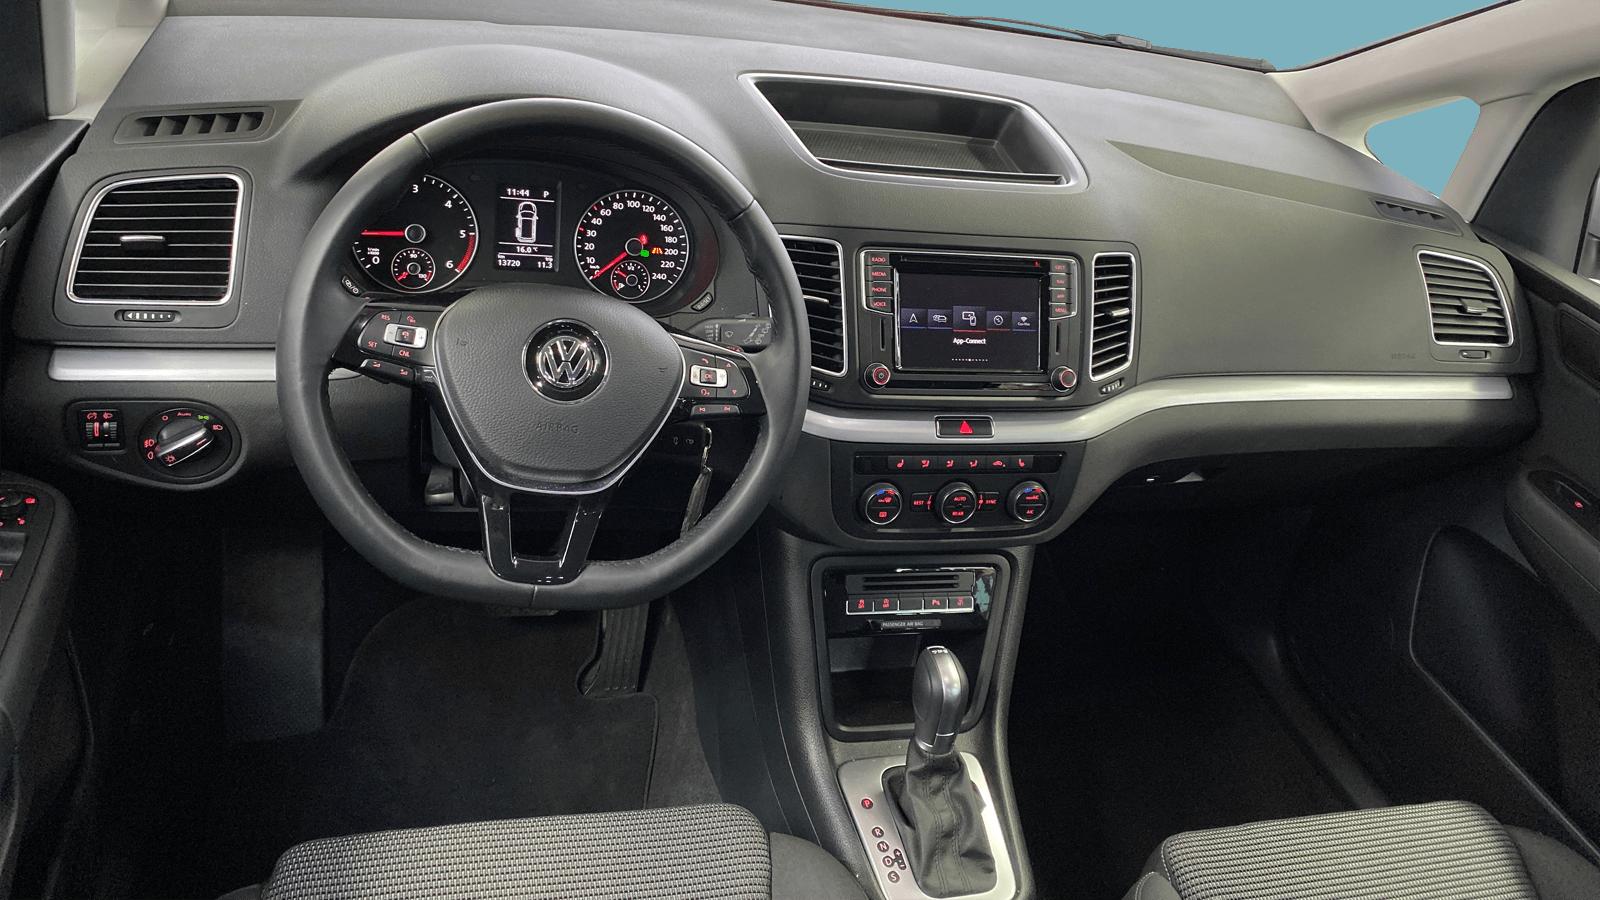 VW Sharan Silver interior - Clyde car subscription